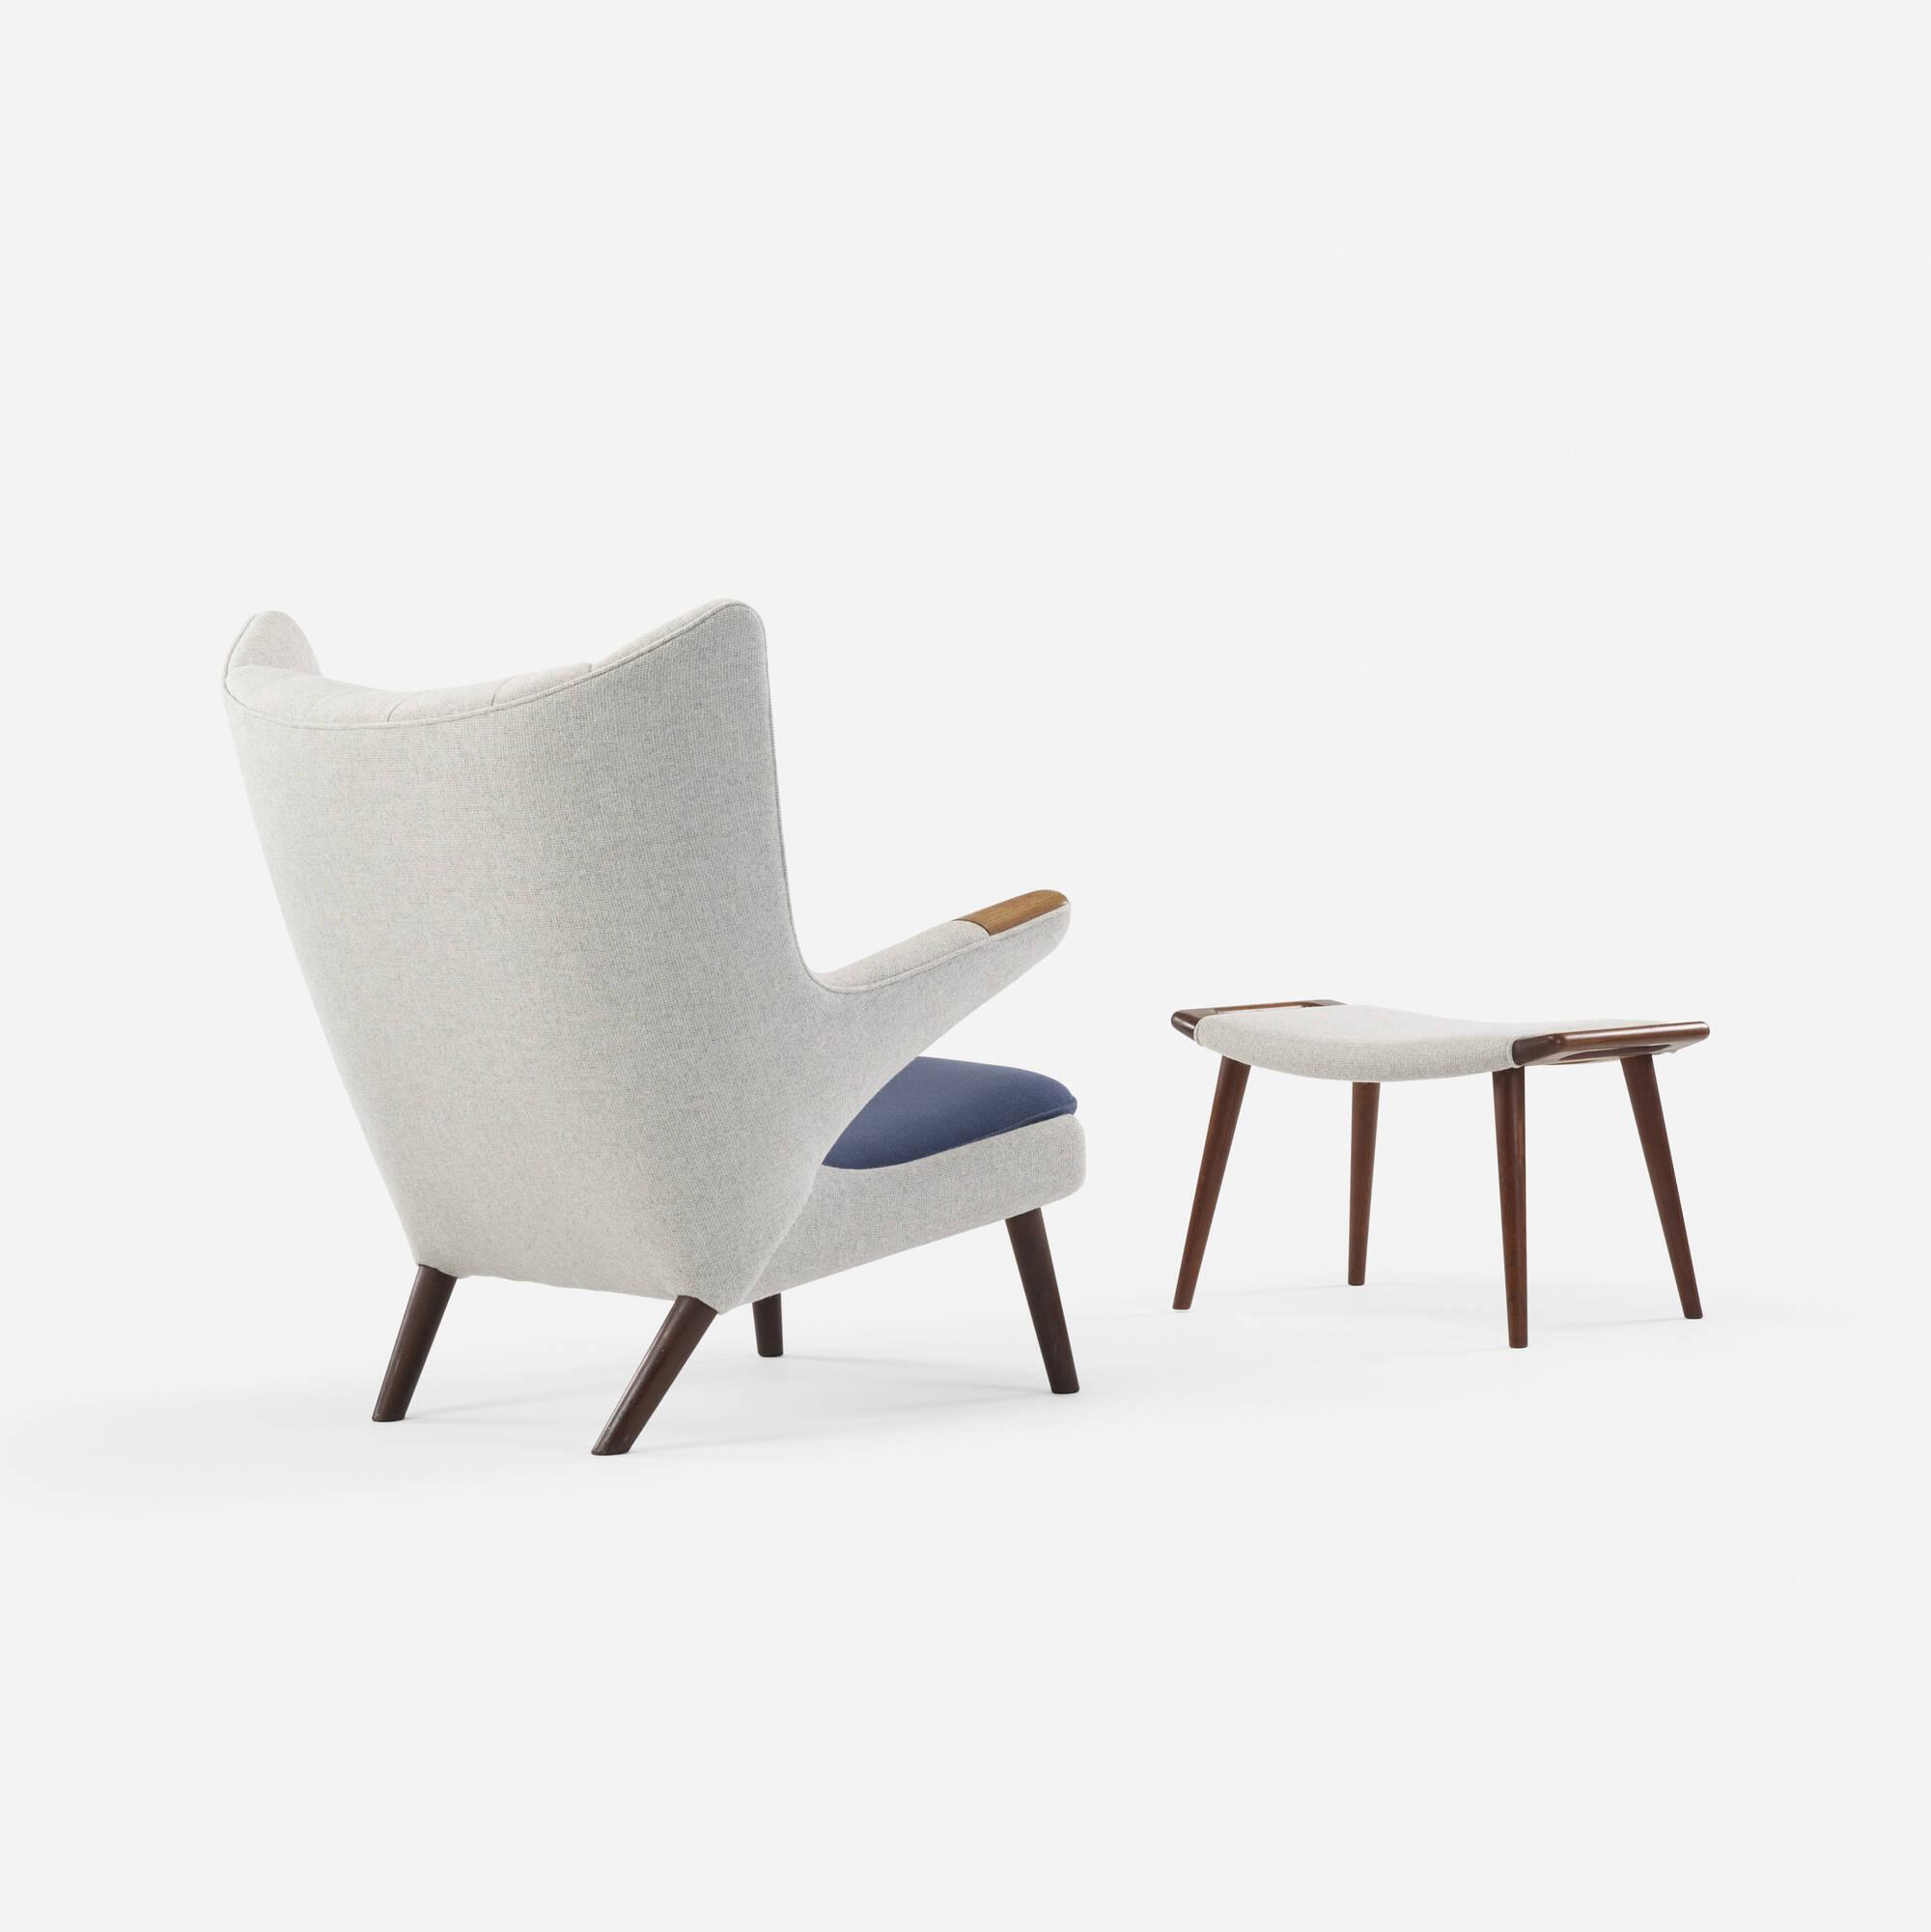 363 Hans J Wegner Papa Bear chair and ottoman Design 24